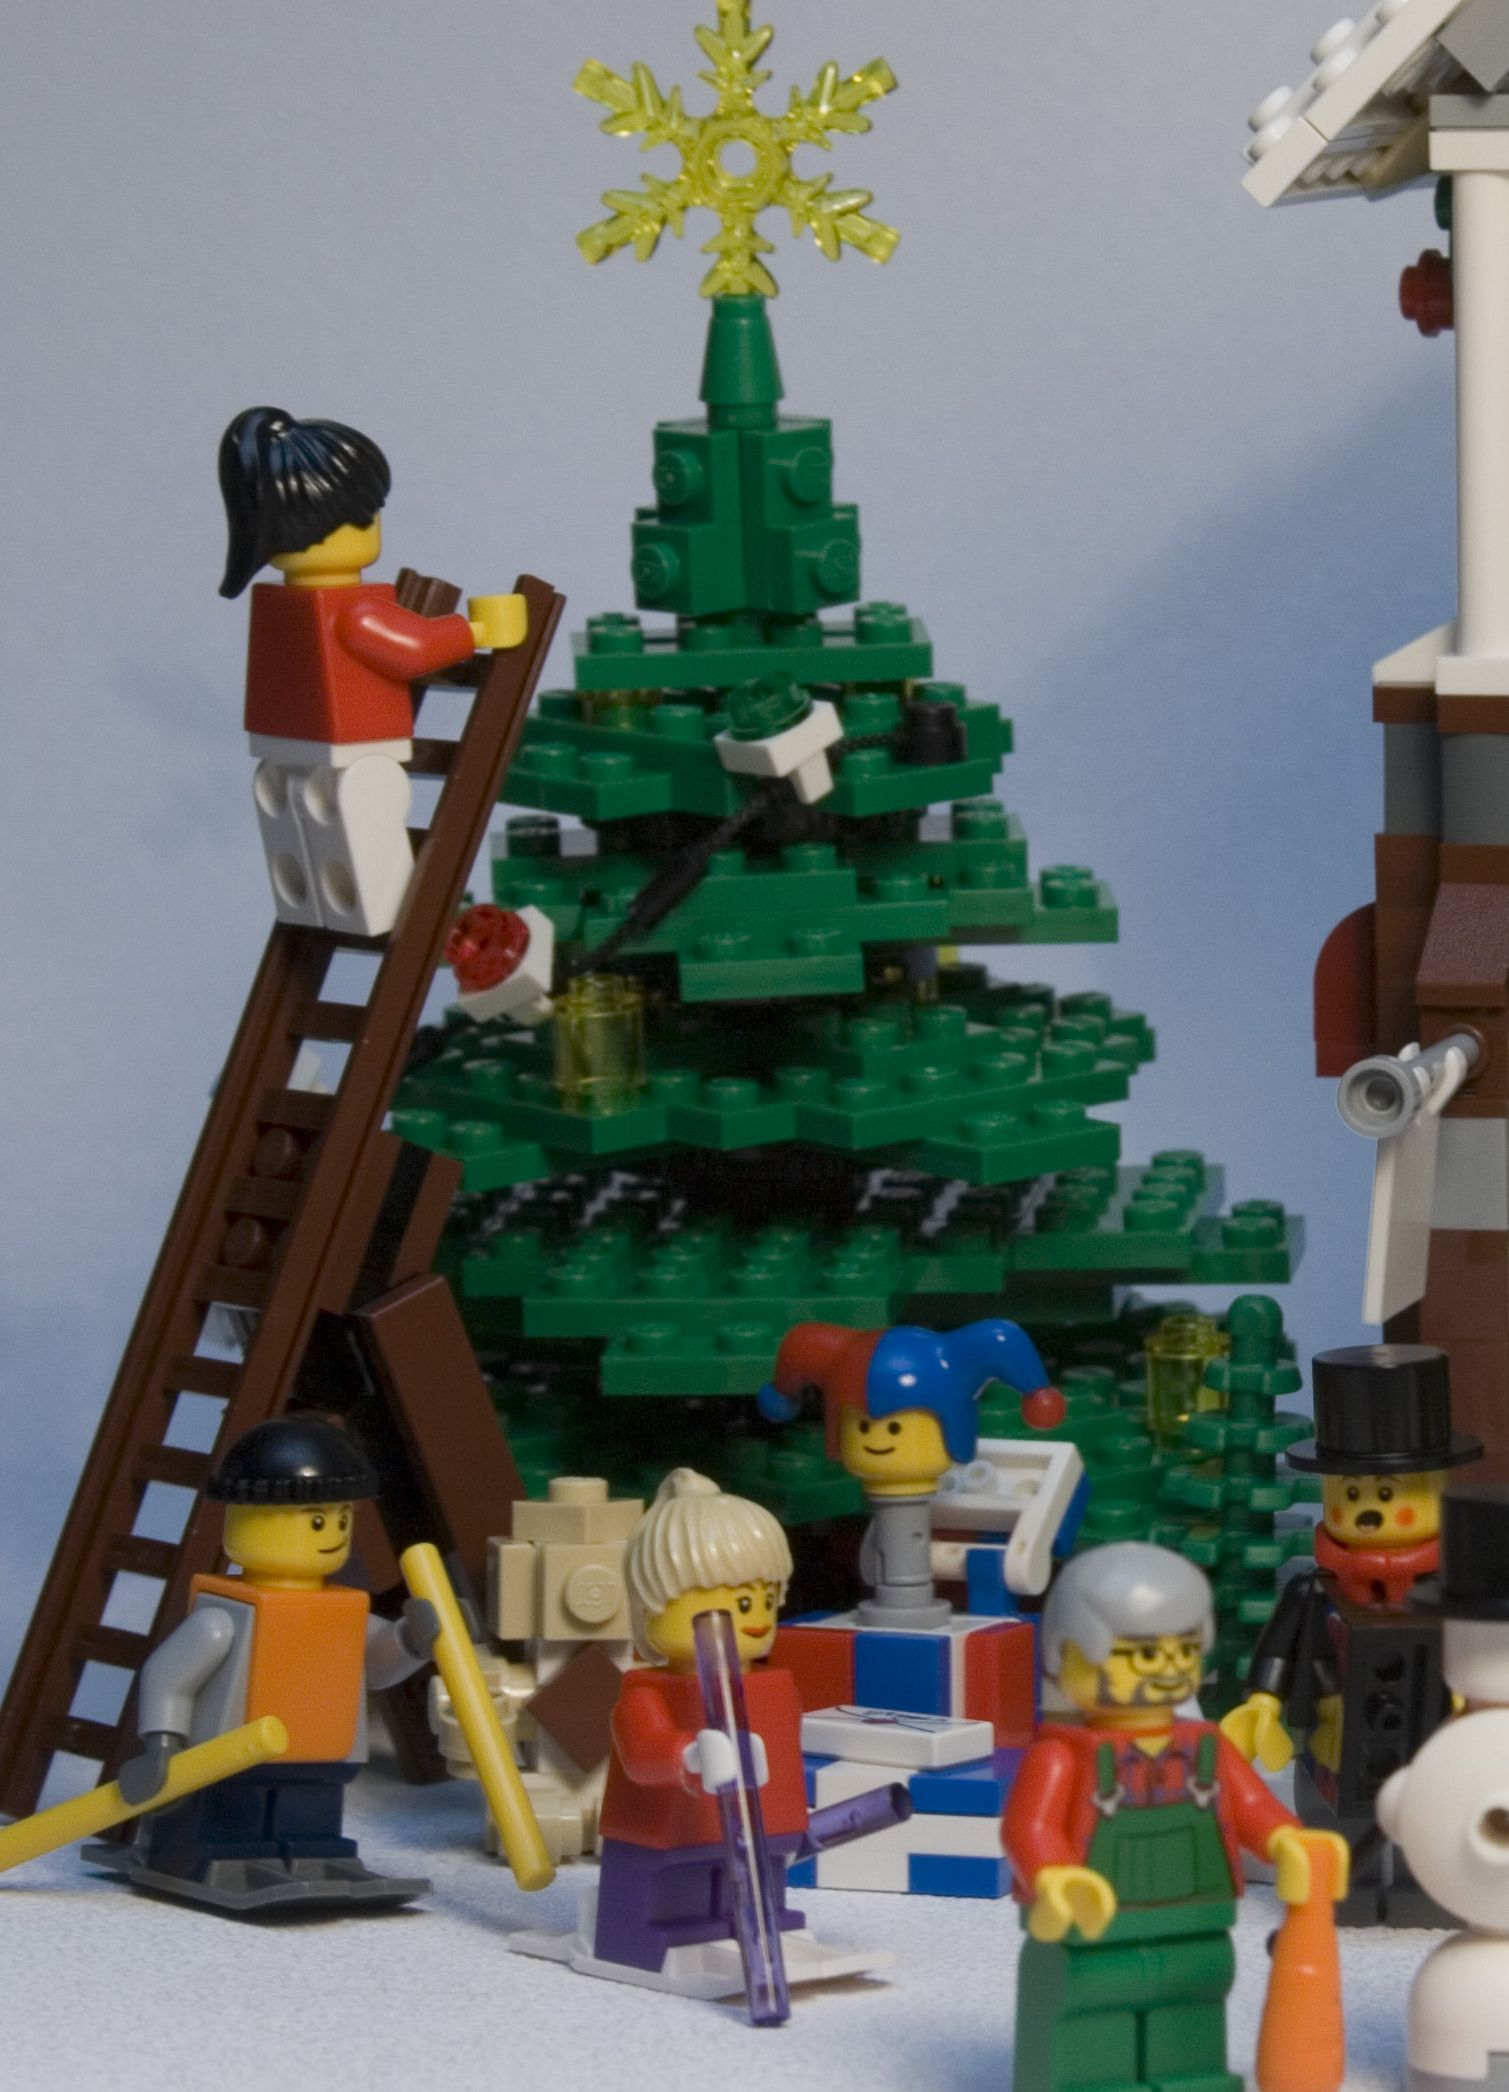 Lego 10199 Winter Village Toy Shop I Brick City